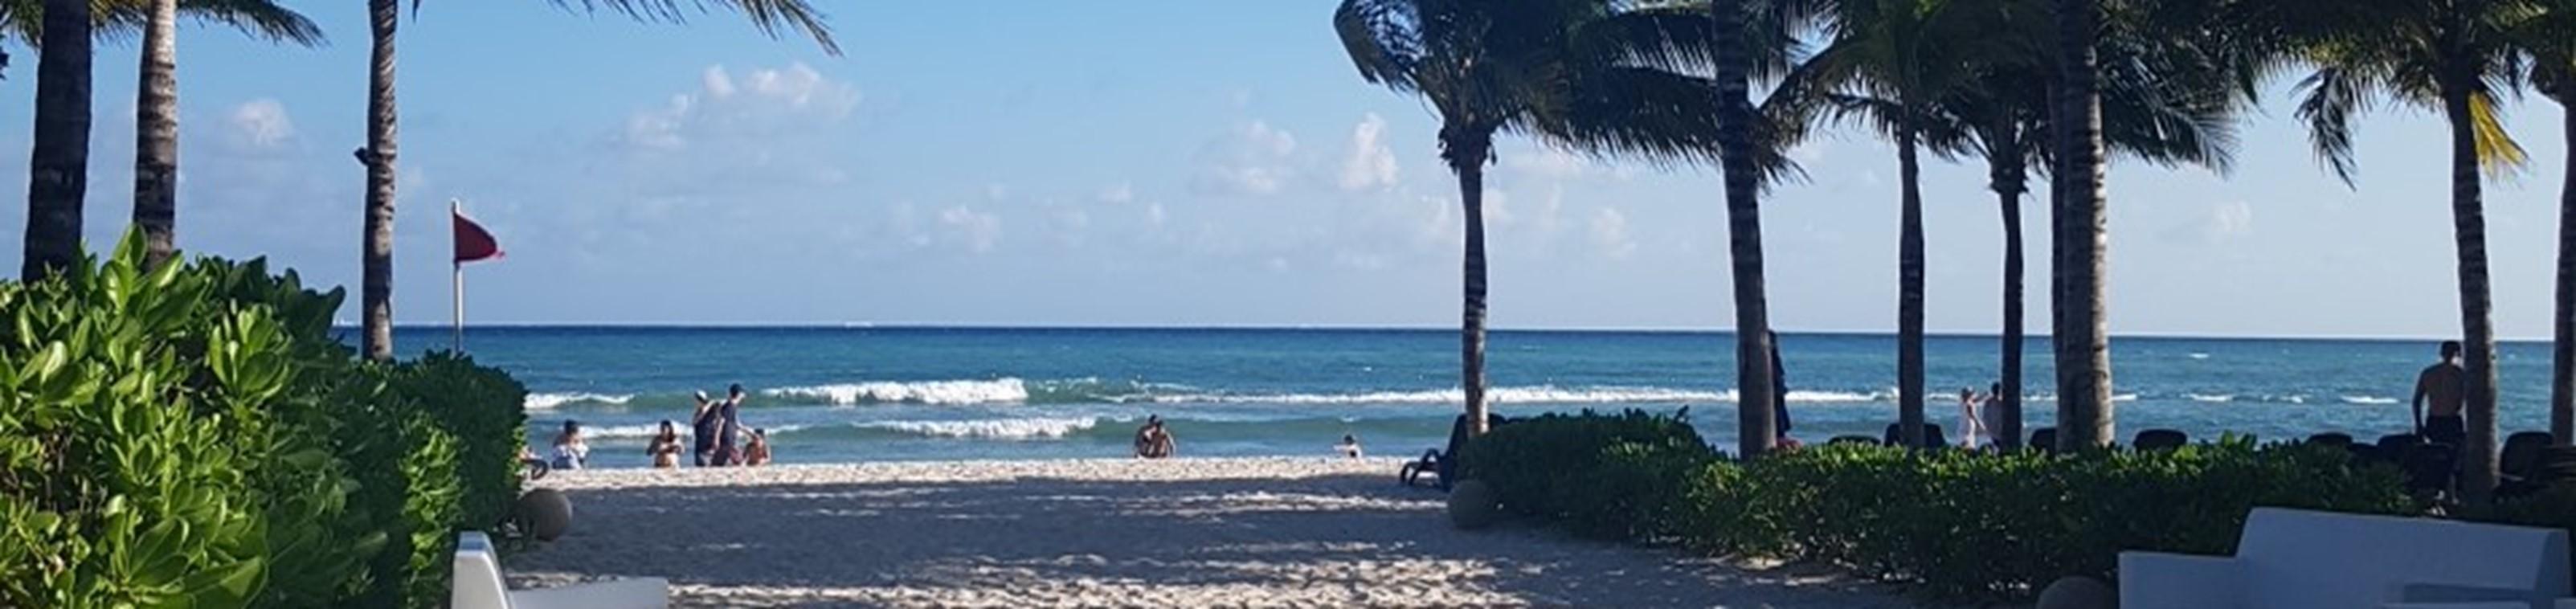 Sandos Caracol Eco Resort in Playa del Carmen (Cancun)